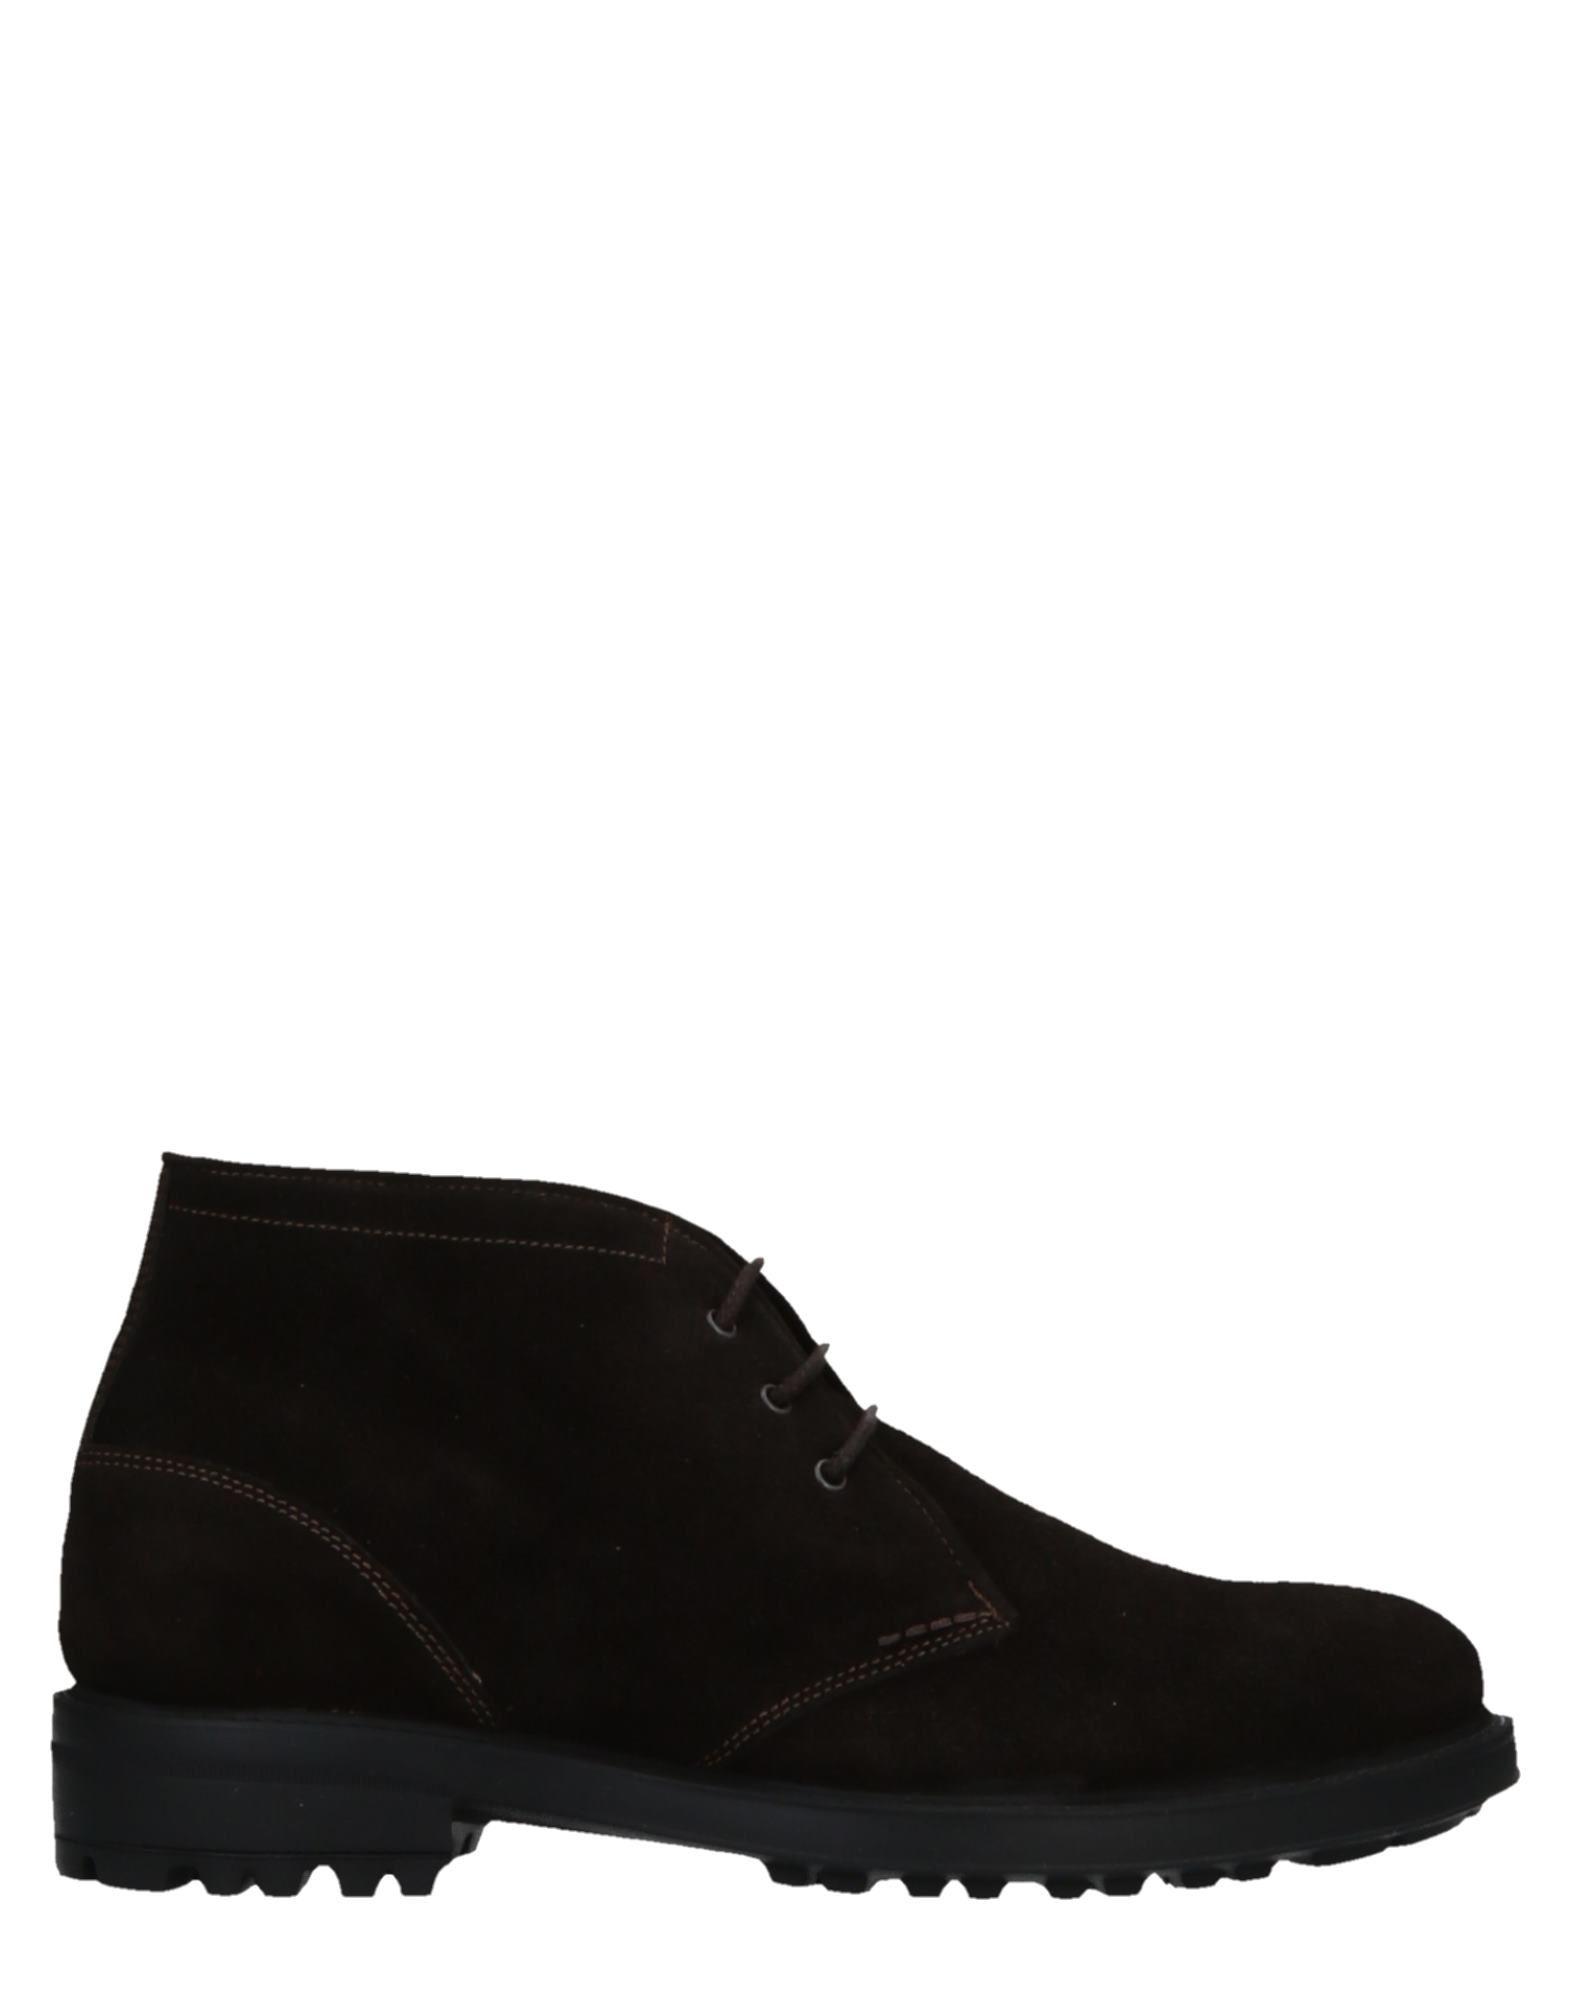 Rabatt echte  Schuhe Winsor Stiefelette Herren  echte 11515763JB 3a0332